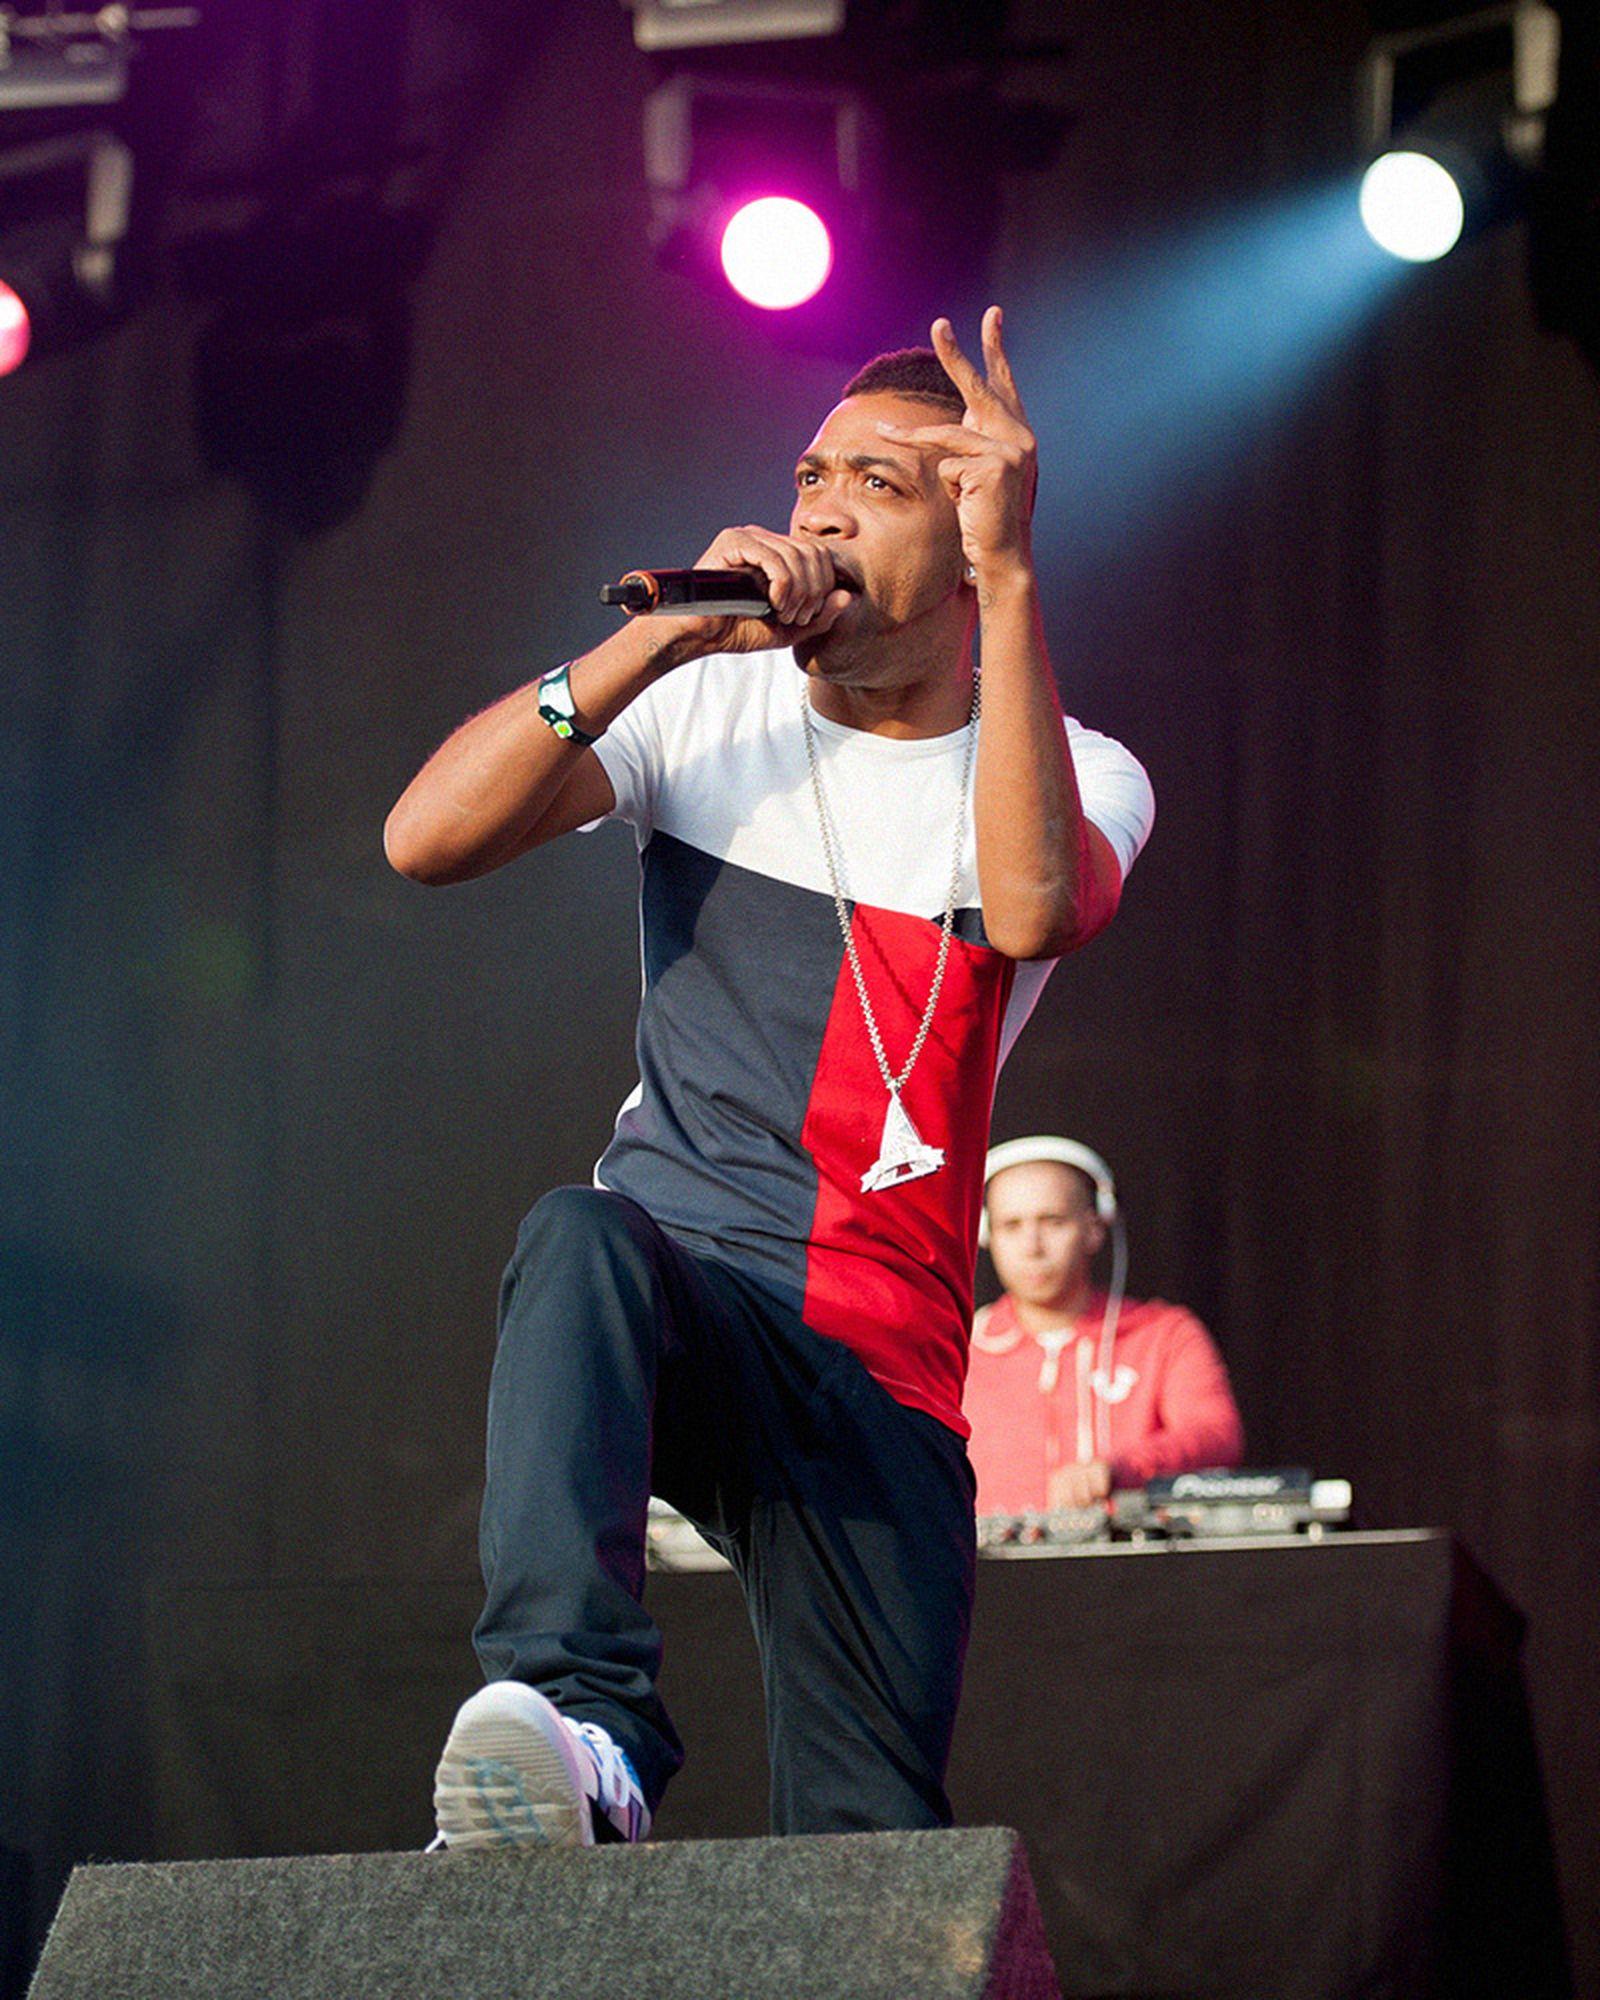 music african diaspora came dominate uk scene Craig David dizzee rascal identity & representation